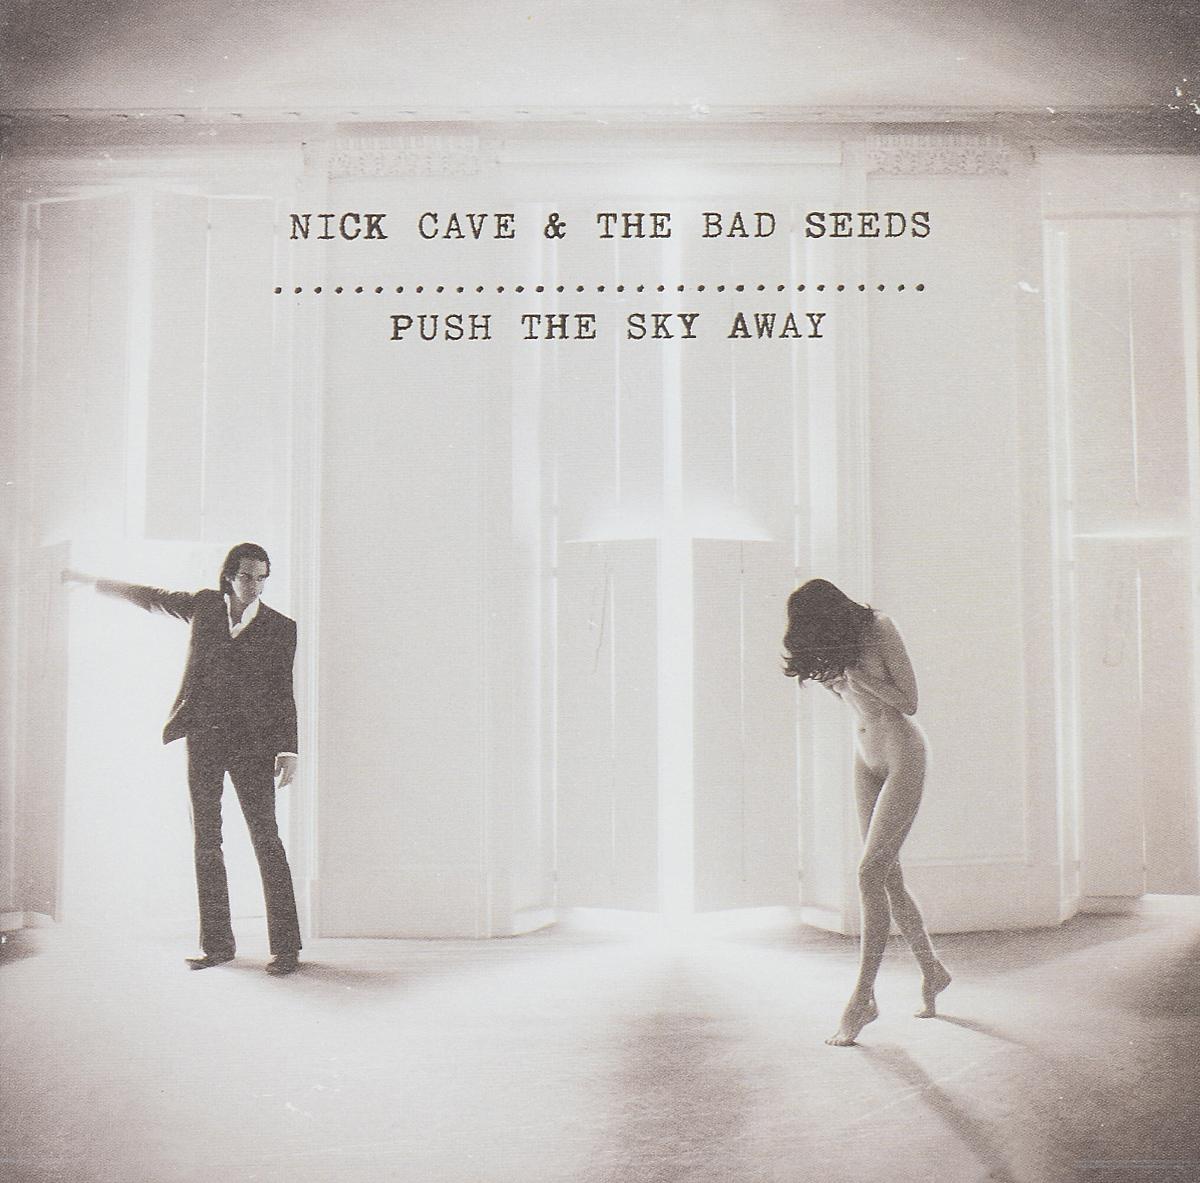 Ник Кейв,The Bad Seeds Nick Cave & The Bad Seeds. Push The Sky Away майка классическая printio во все тяжкие braiking bad ч б